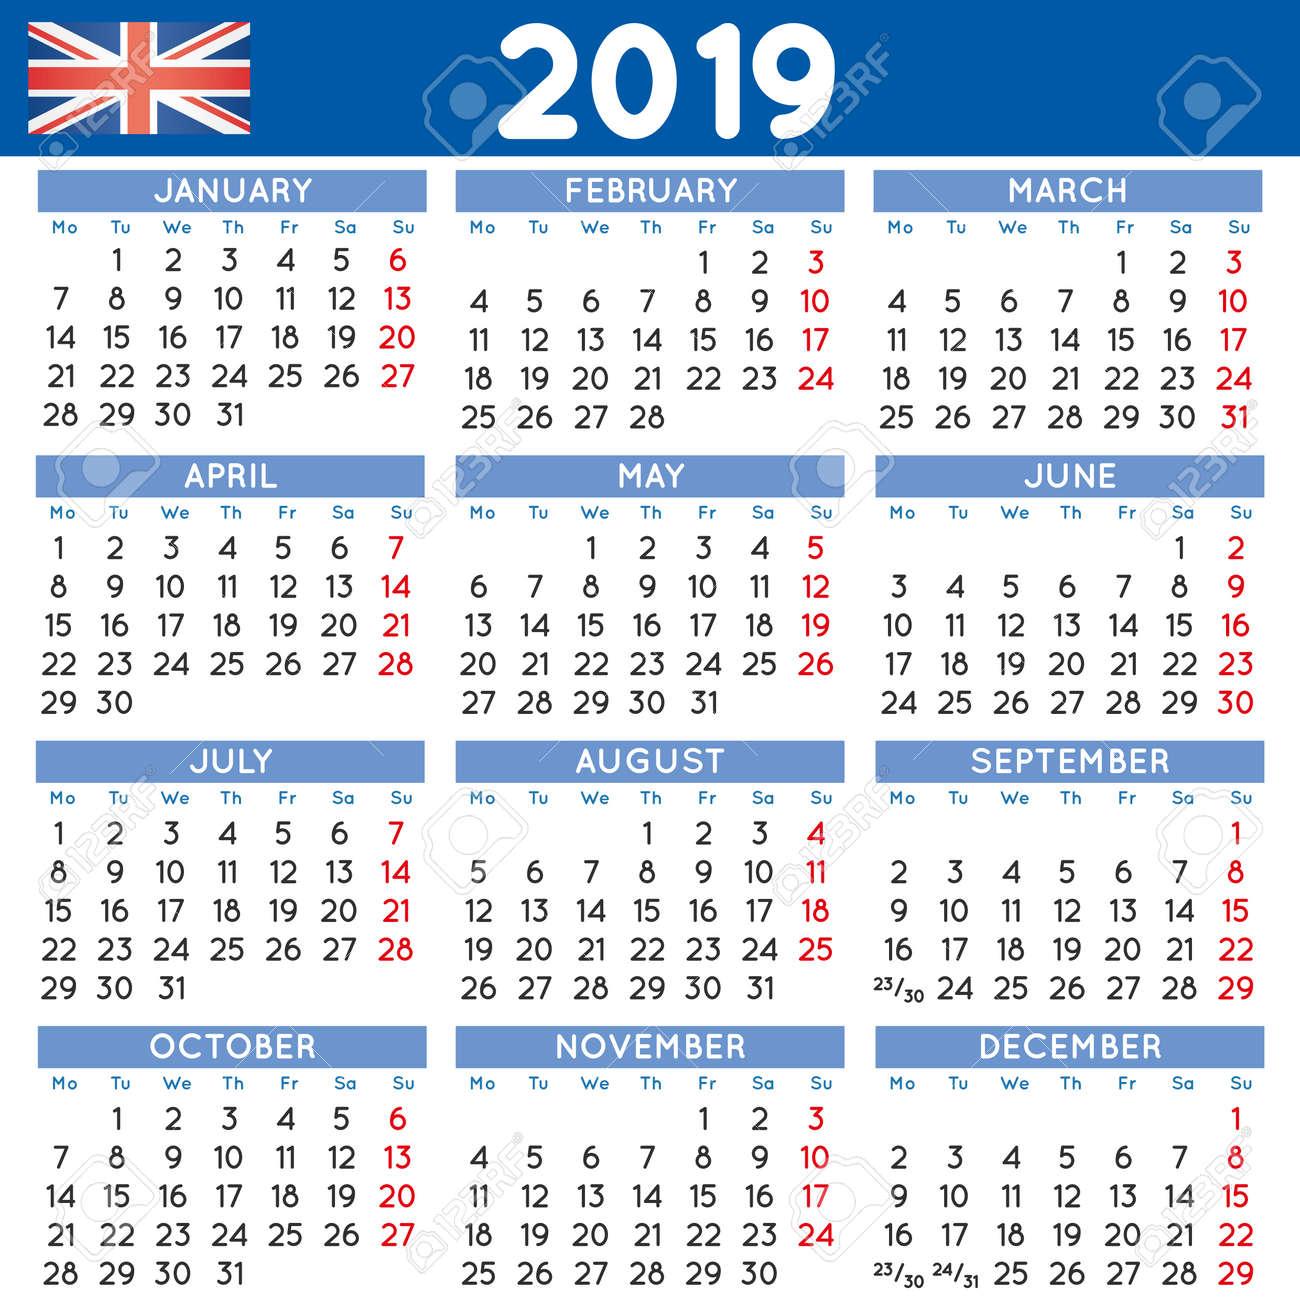 Calendar 2019 Uk 2019 Elegant Squared Calendar English UK. Year 2019 Calendar